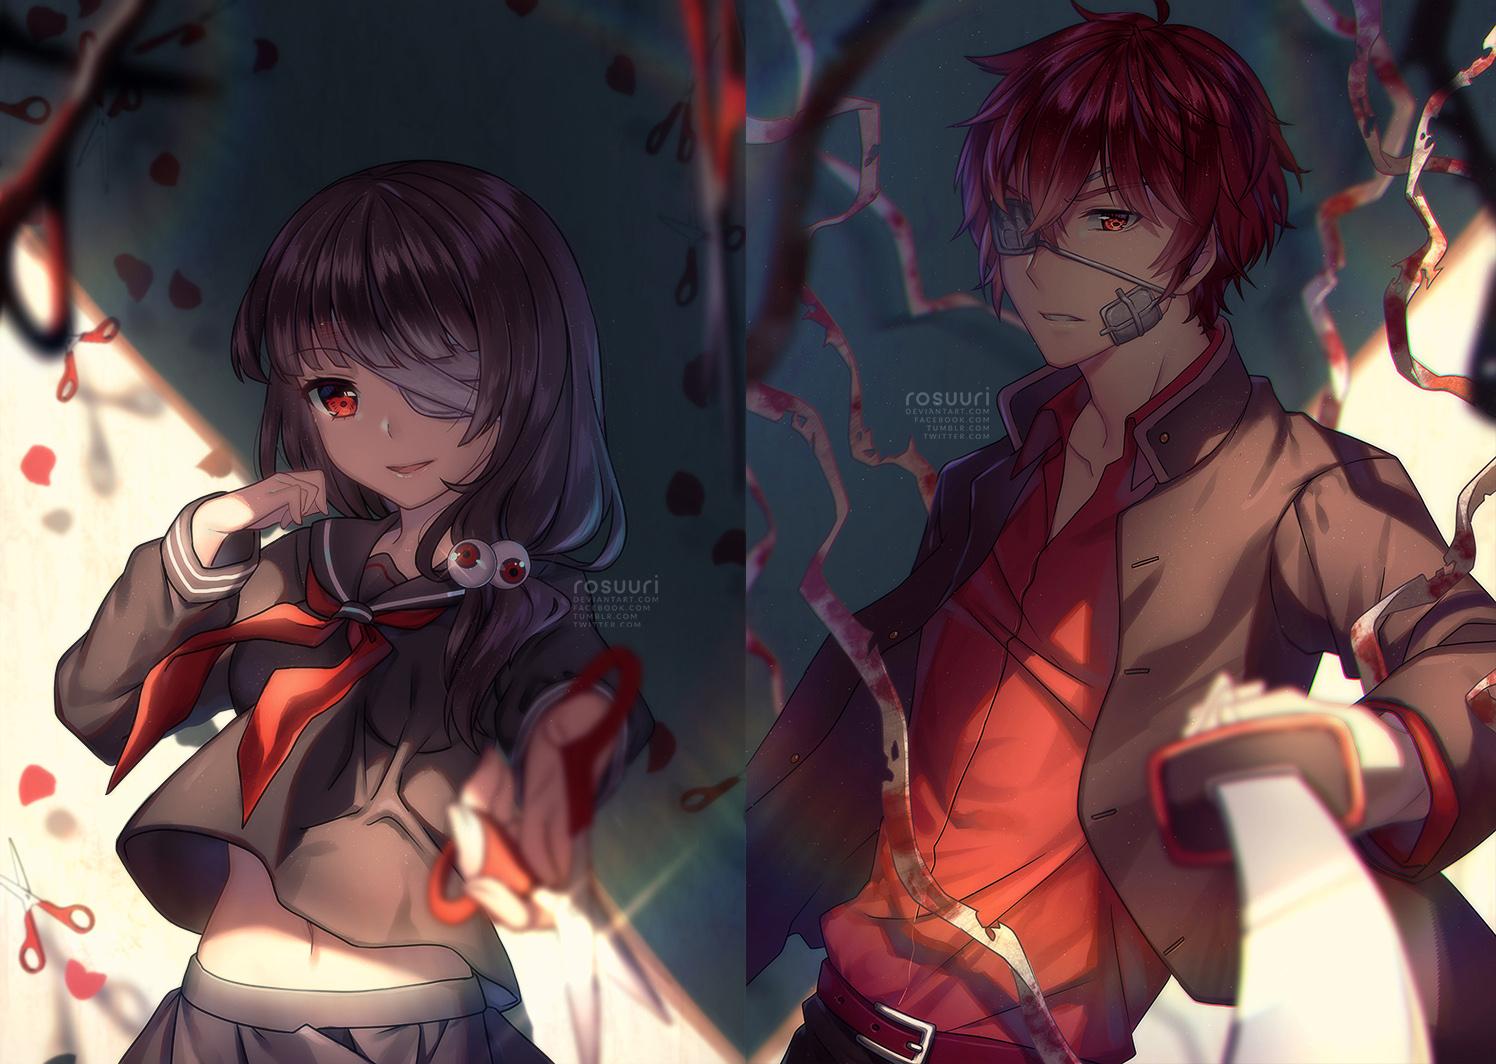 Love Hate by Rosuuri